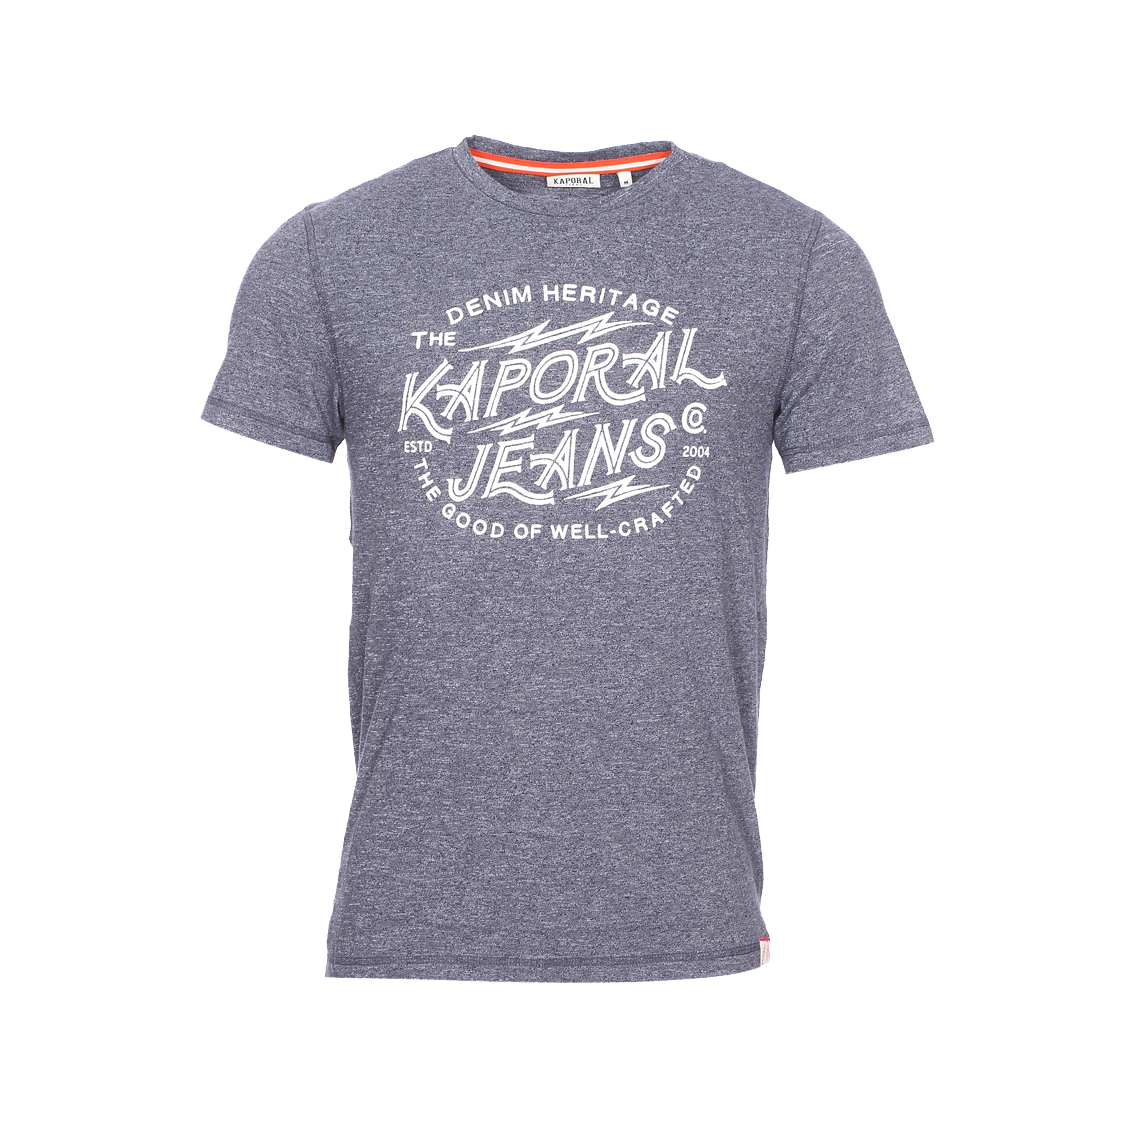 Tee-shirt col rond  pagan en coton mélangé bleu marine chiné floqué en blanc